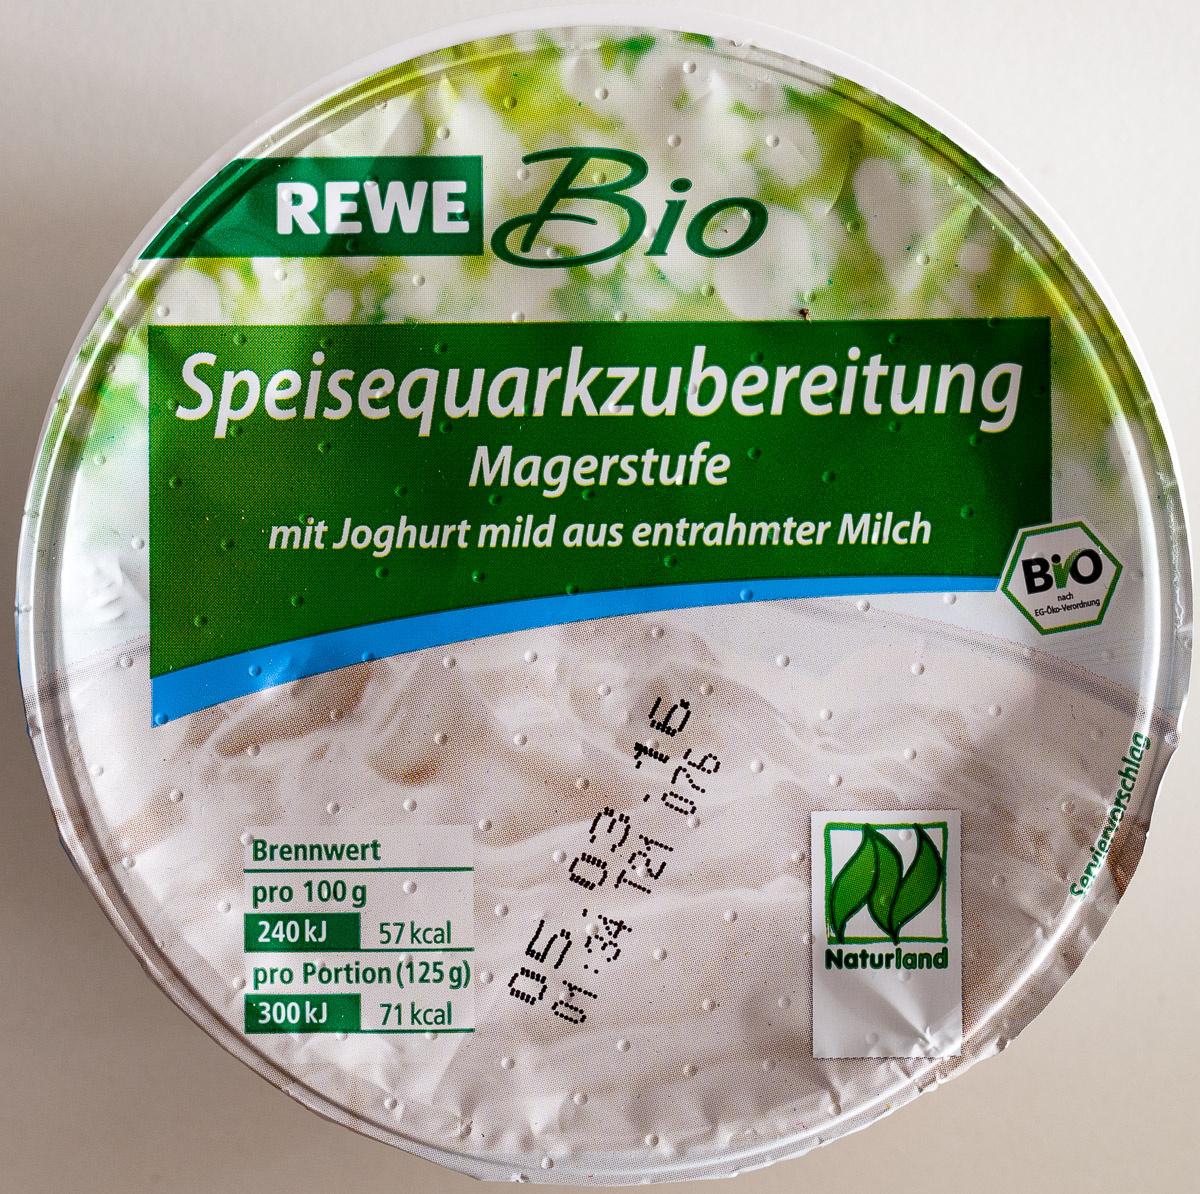 Speisequark zubereitung - Product